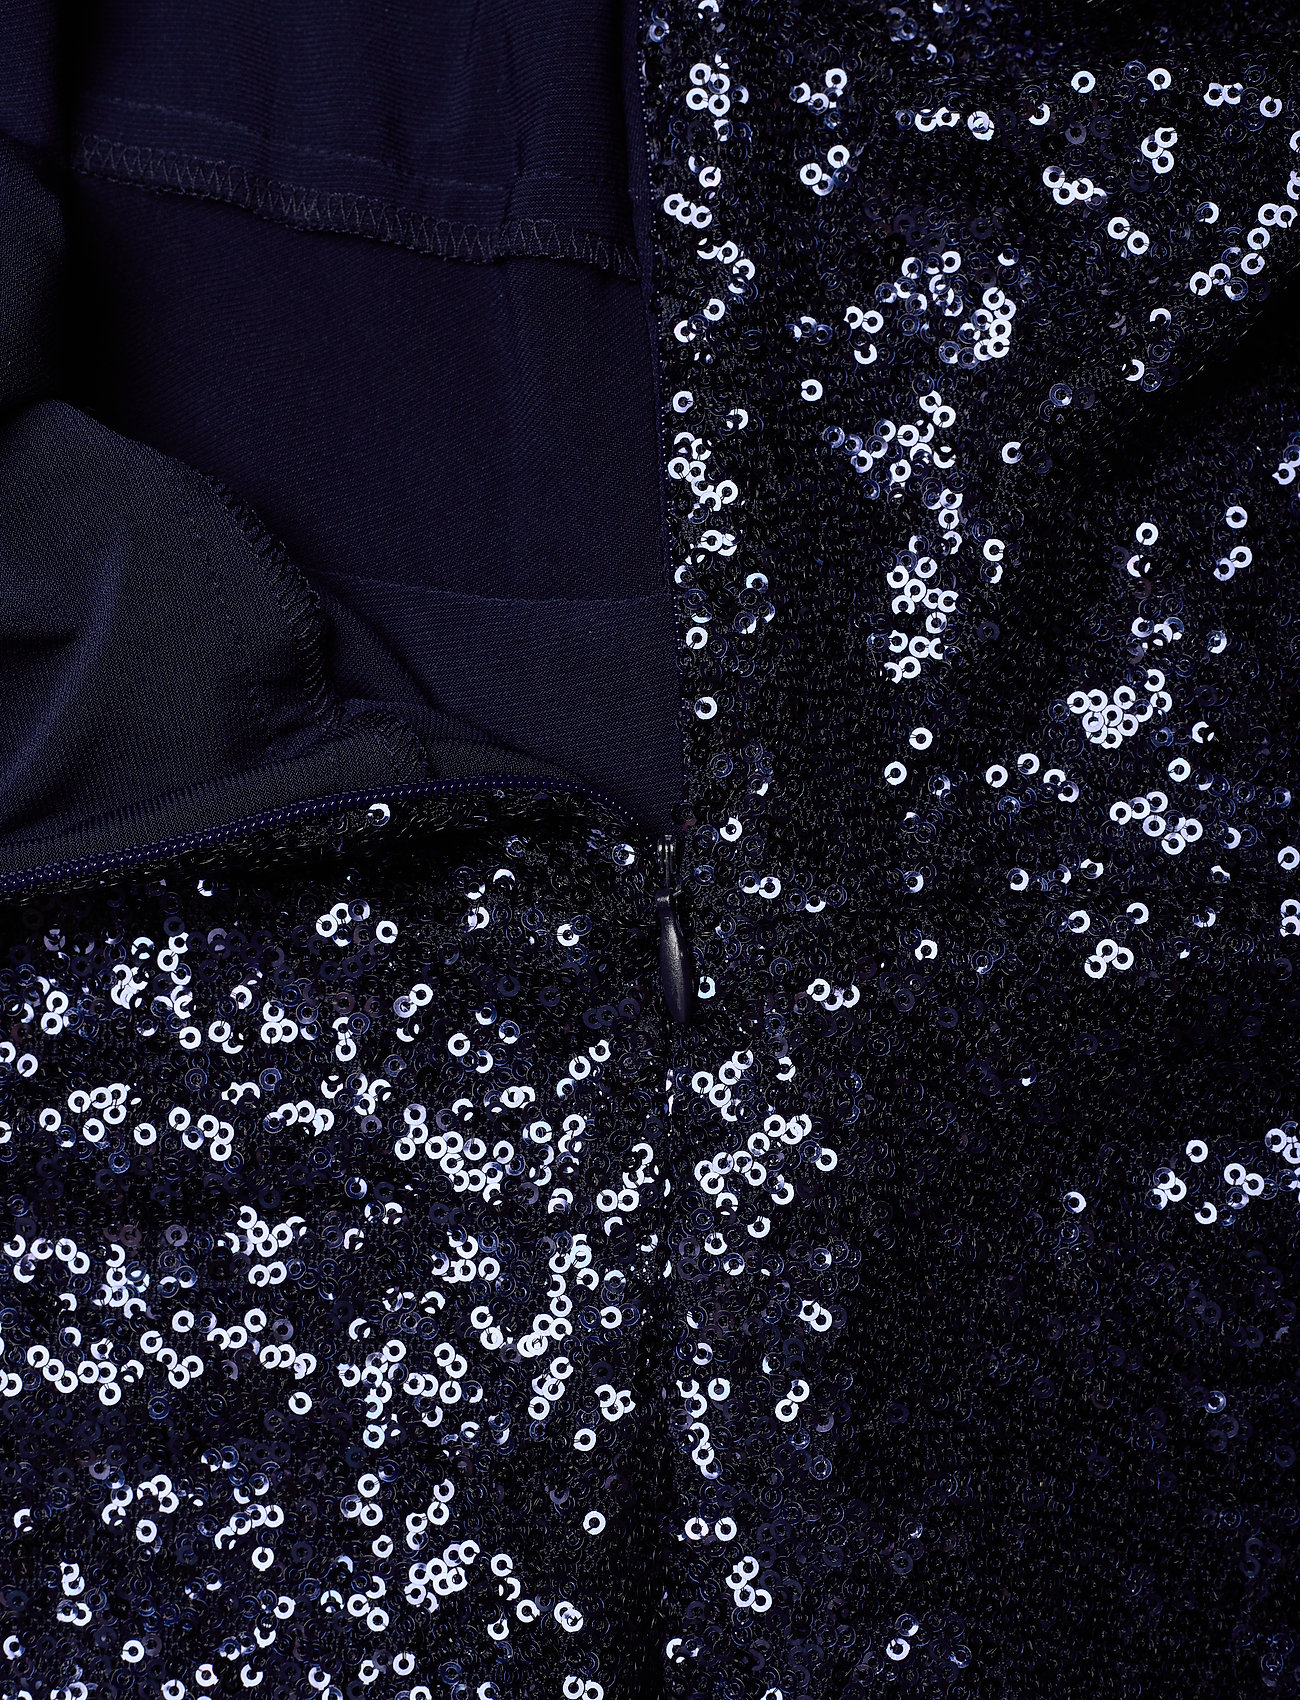 Lauren Ralph Lauren SEQUIN MESH-COCKTAIL DRESS - Kjoler LIGHTHOUSE NAVY - Dametøj Særtilbud